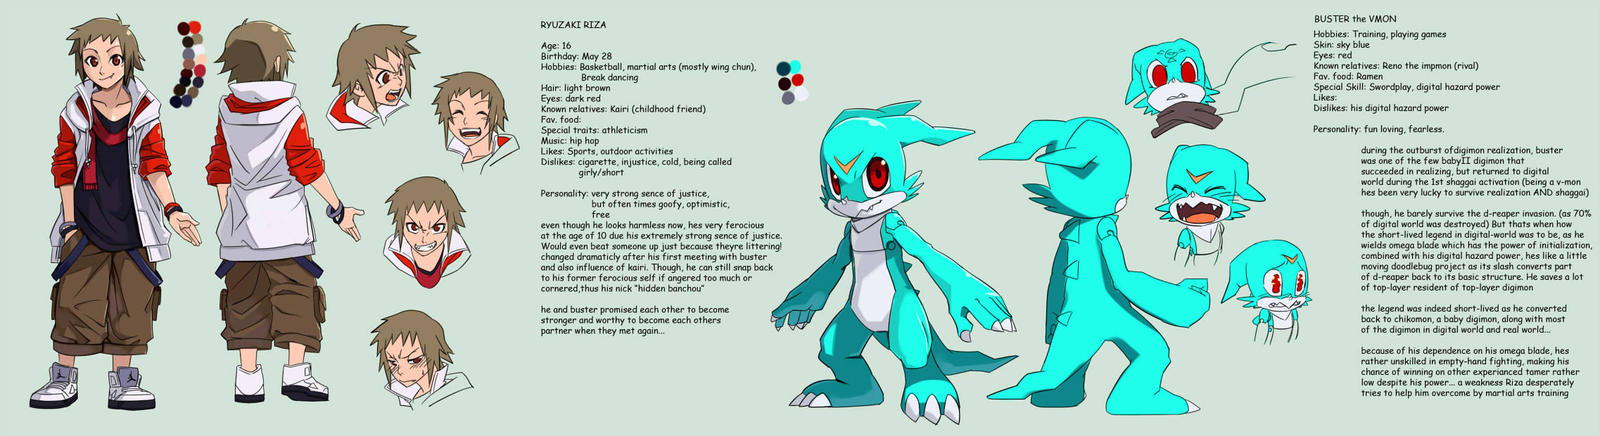 Digimon tamers: mirai character 1 - Ryuzaki Riza by Riza23